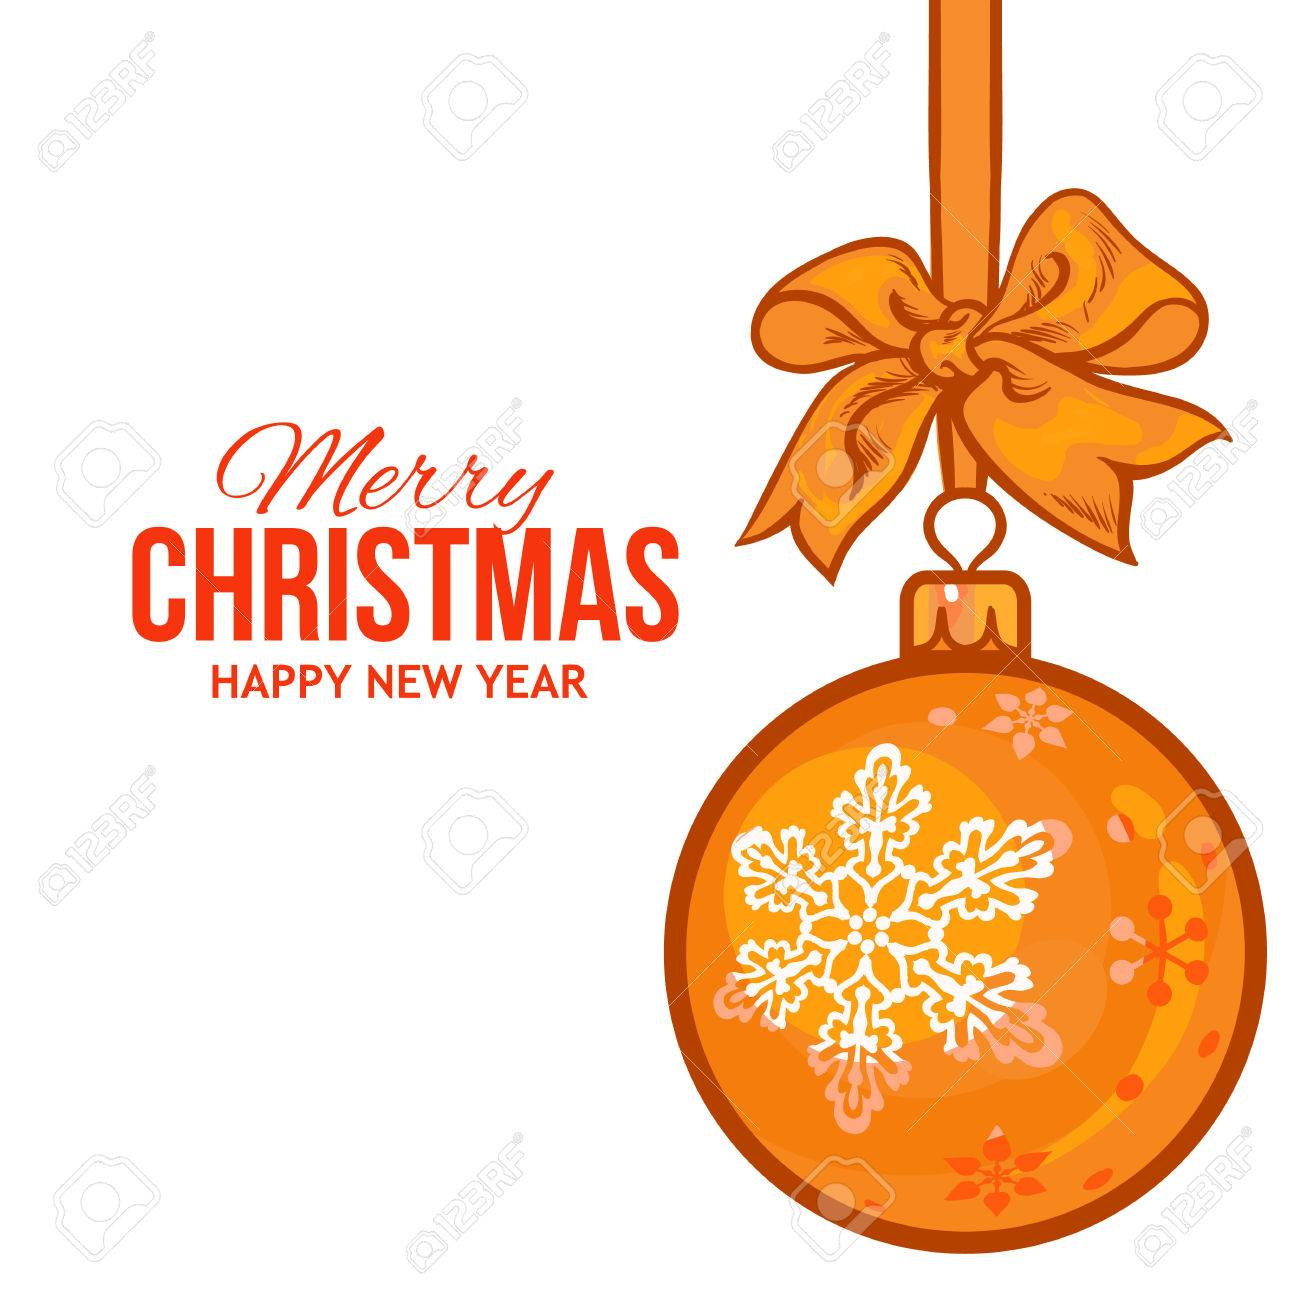 Nice Häkeln Weihnachtskugel Muster Festooning - Decke Stricken ...